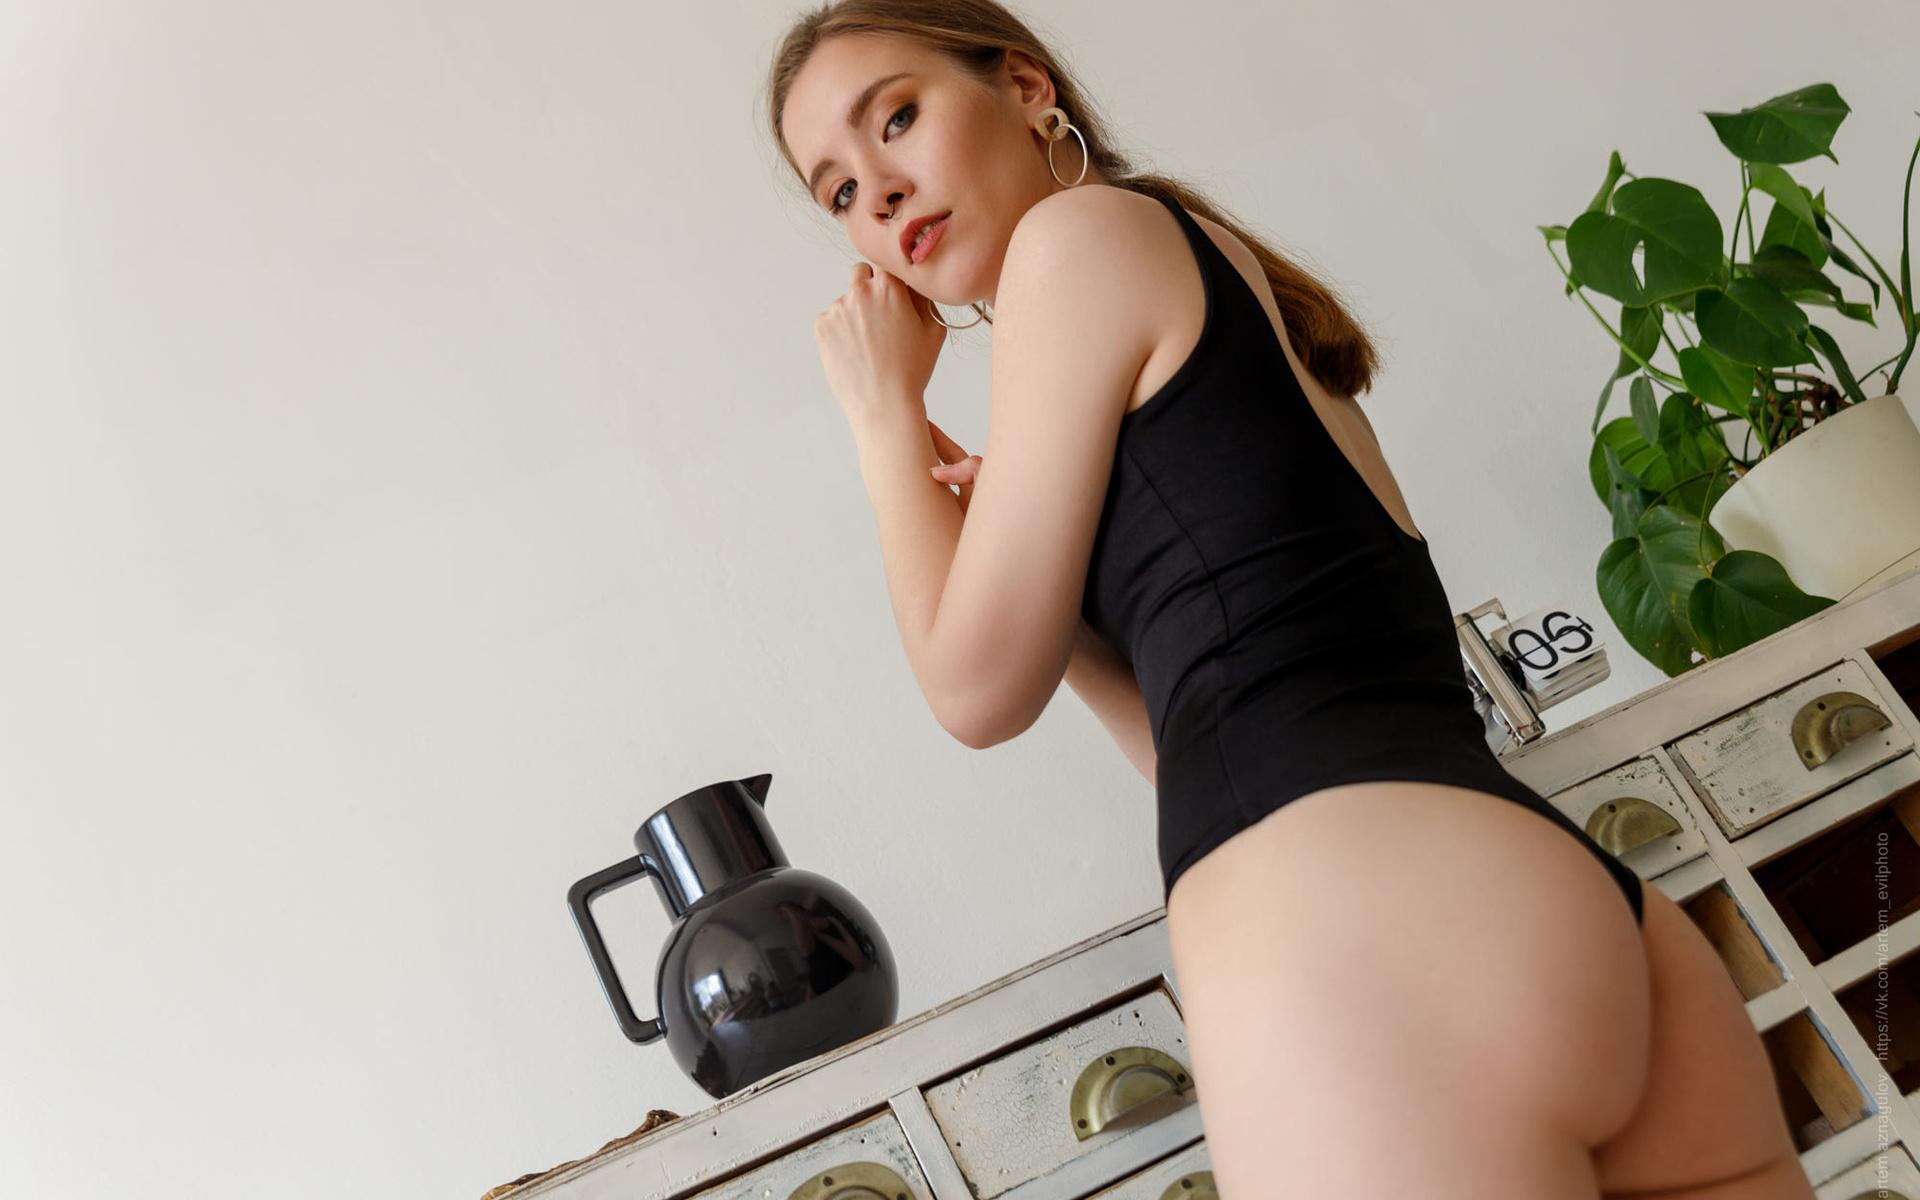 women, ass, women indoors, blonde, bodysuit, plants, wall, hoop earrings, looking at viewer